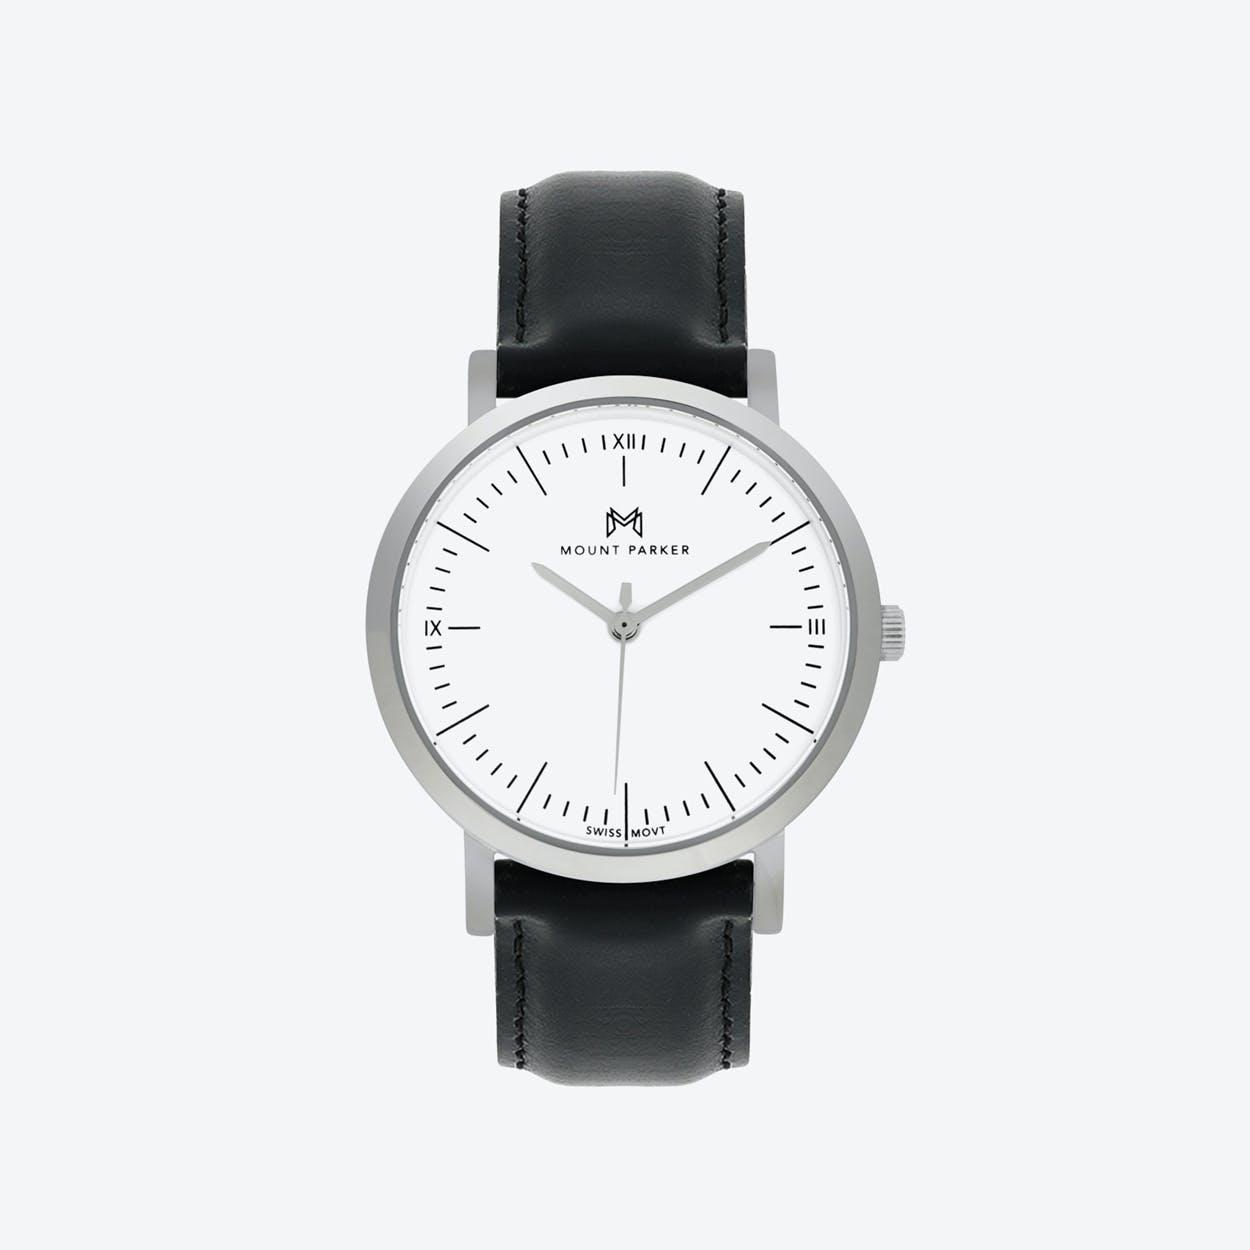 ODYSSEY Watch Glacier Silver with Black Leather Strap, 36mm